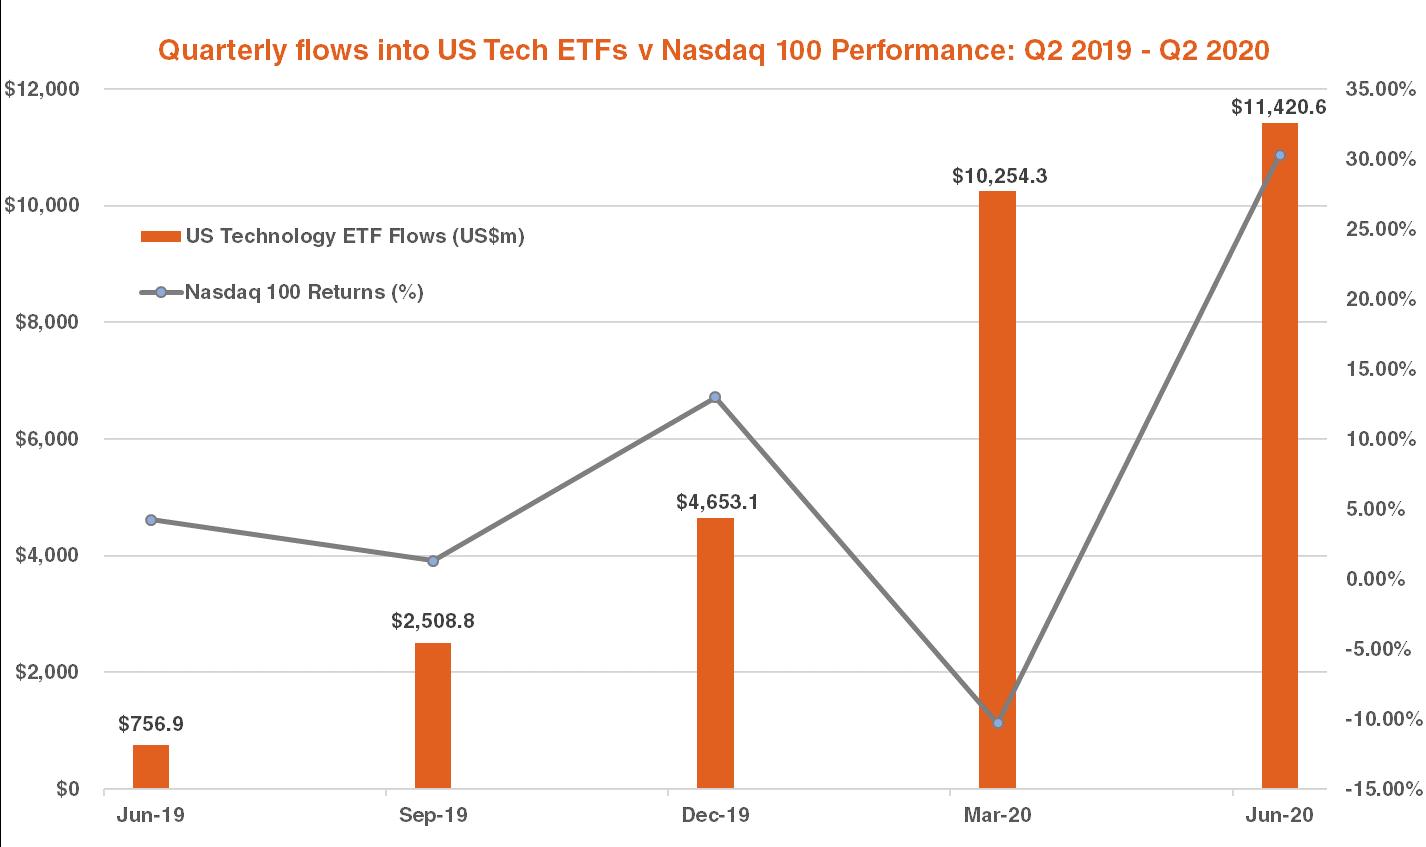 Quarterly flows into US tech ETFs vs Nasdaq 100 performance Q2 2020